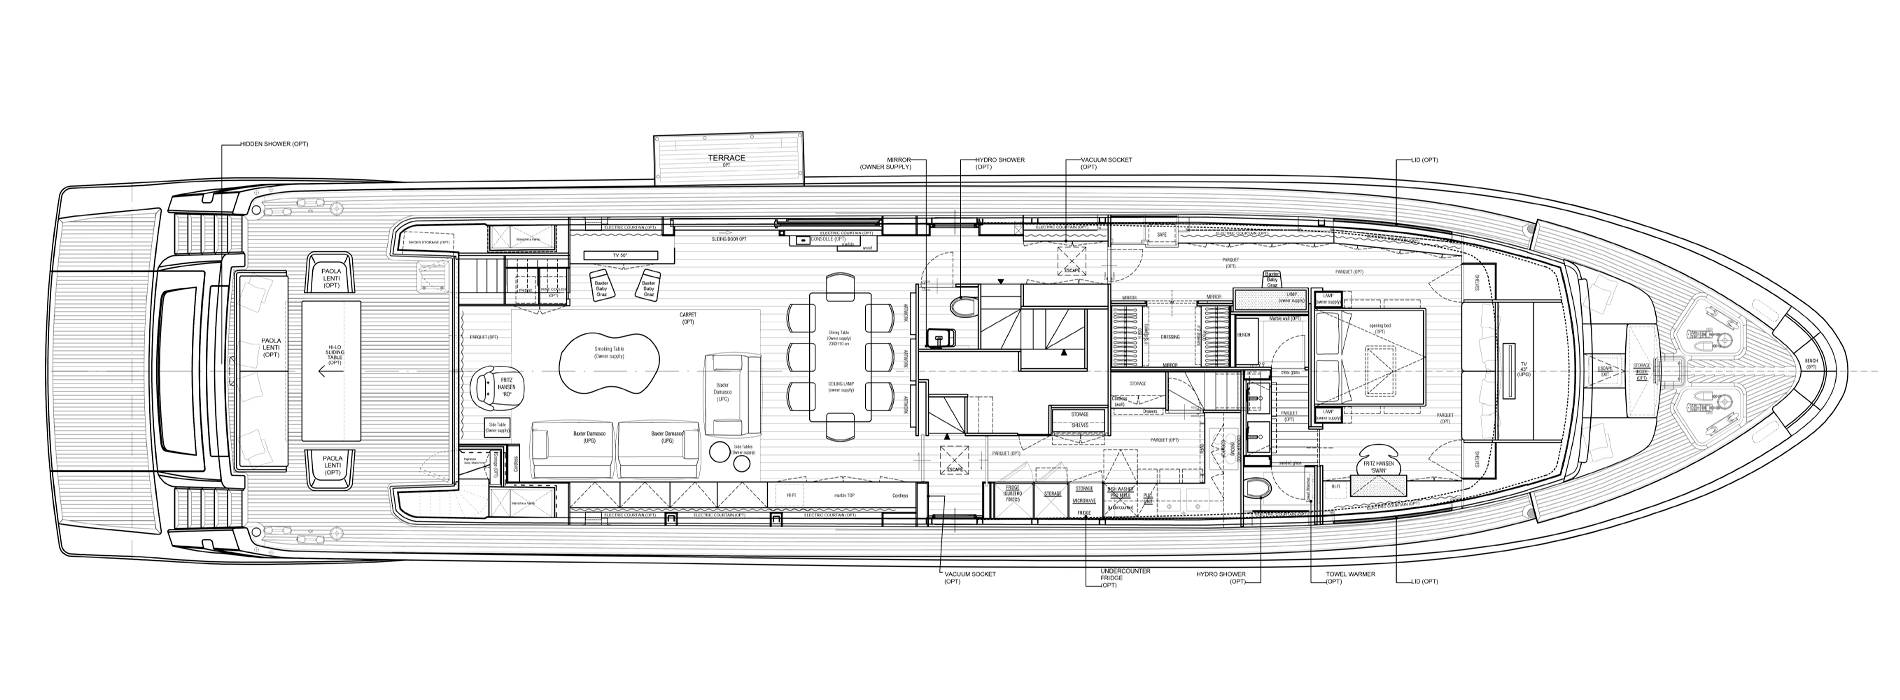 Sanlorenzo Yachts SL106-625 Главная палуба